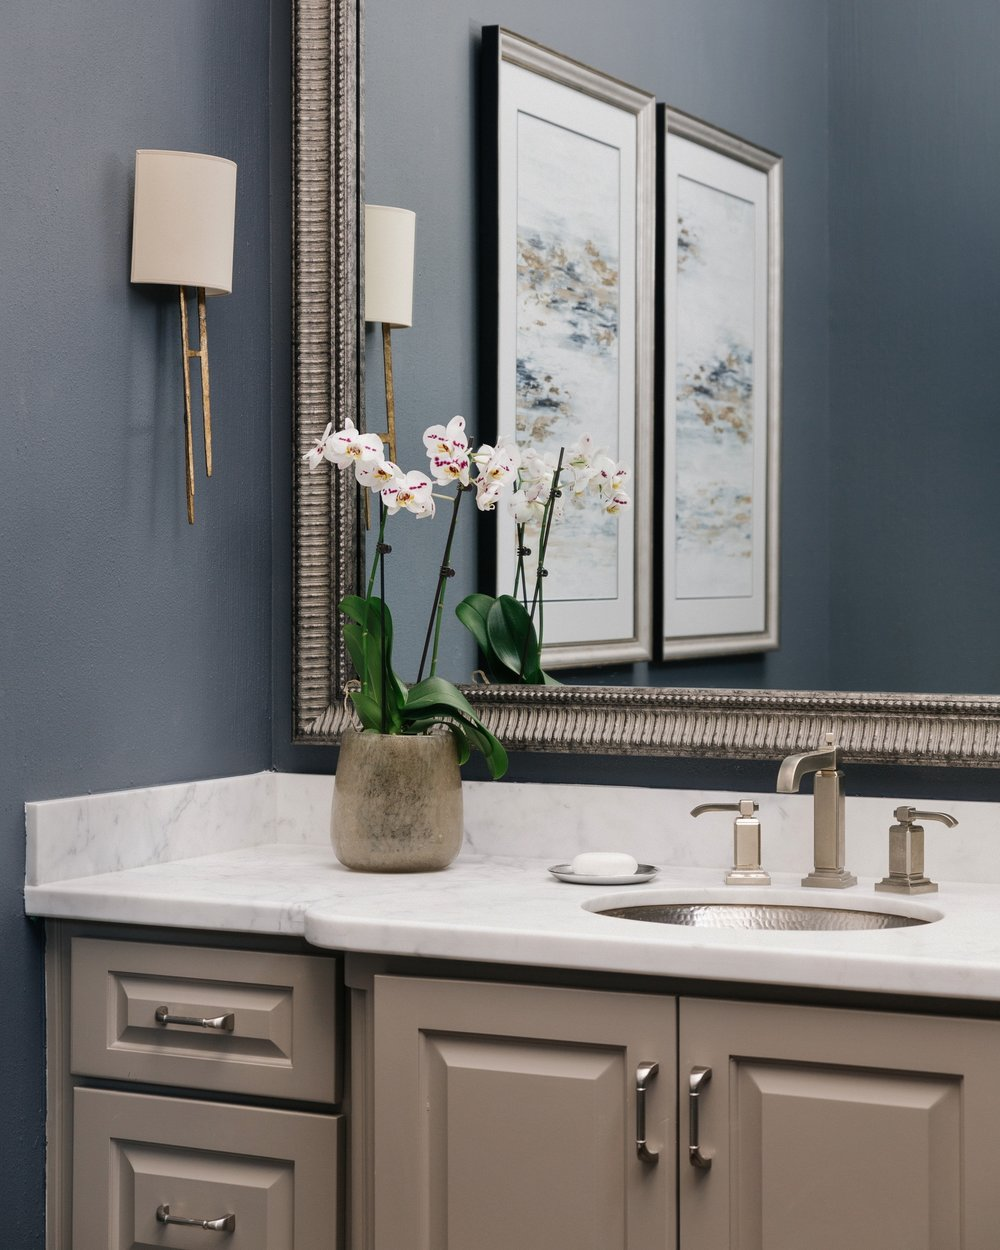 POWDER BATH ROUND UP | white marble counter with hammered nickel sink and slate blue walls | Carla Aston, Designer | Colleen Scott, Photographer #powderroom #powderbath